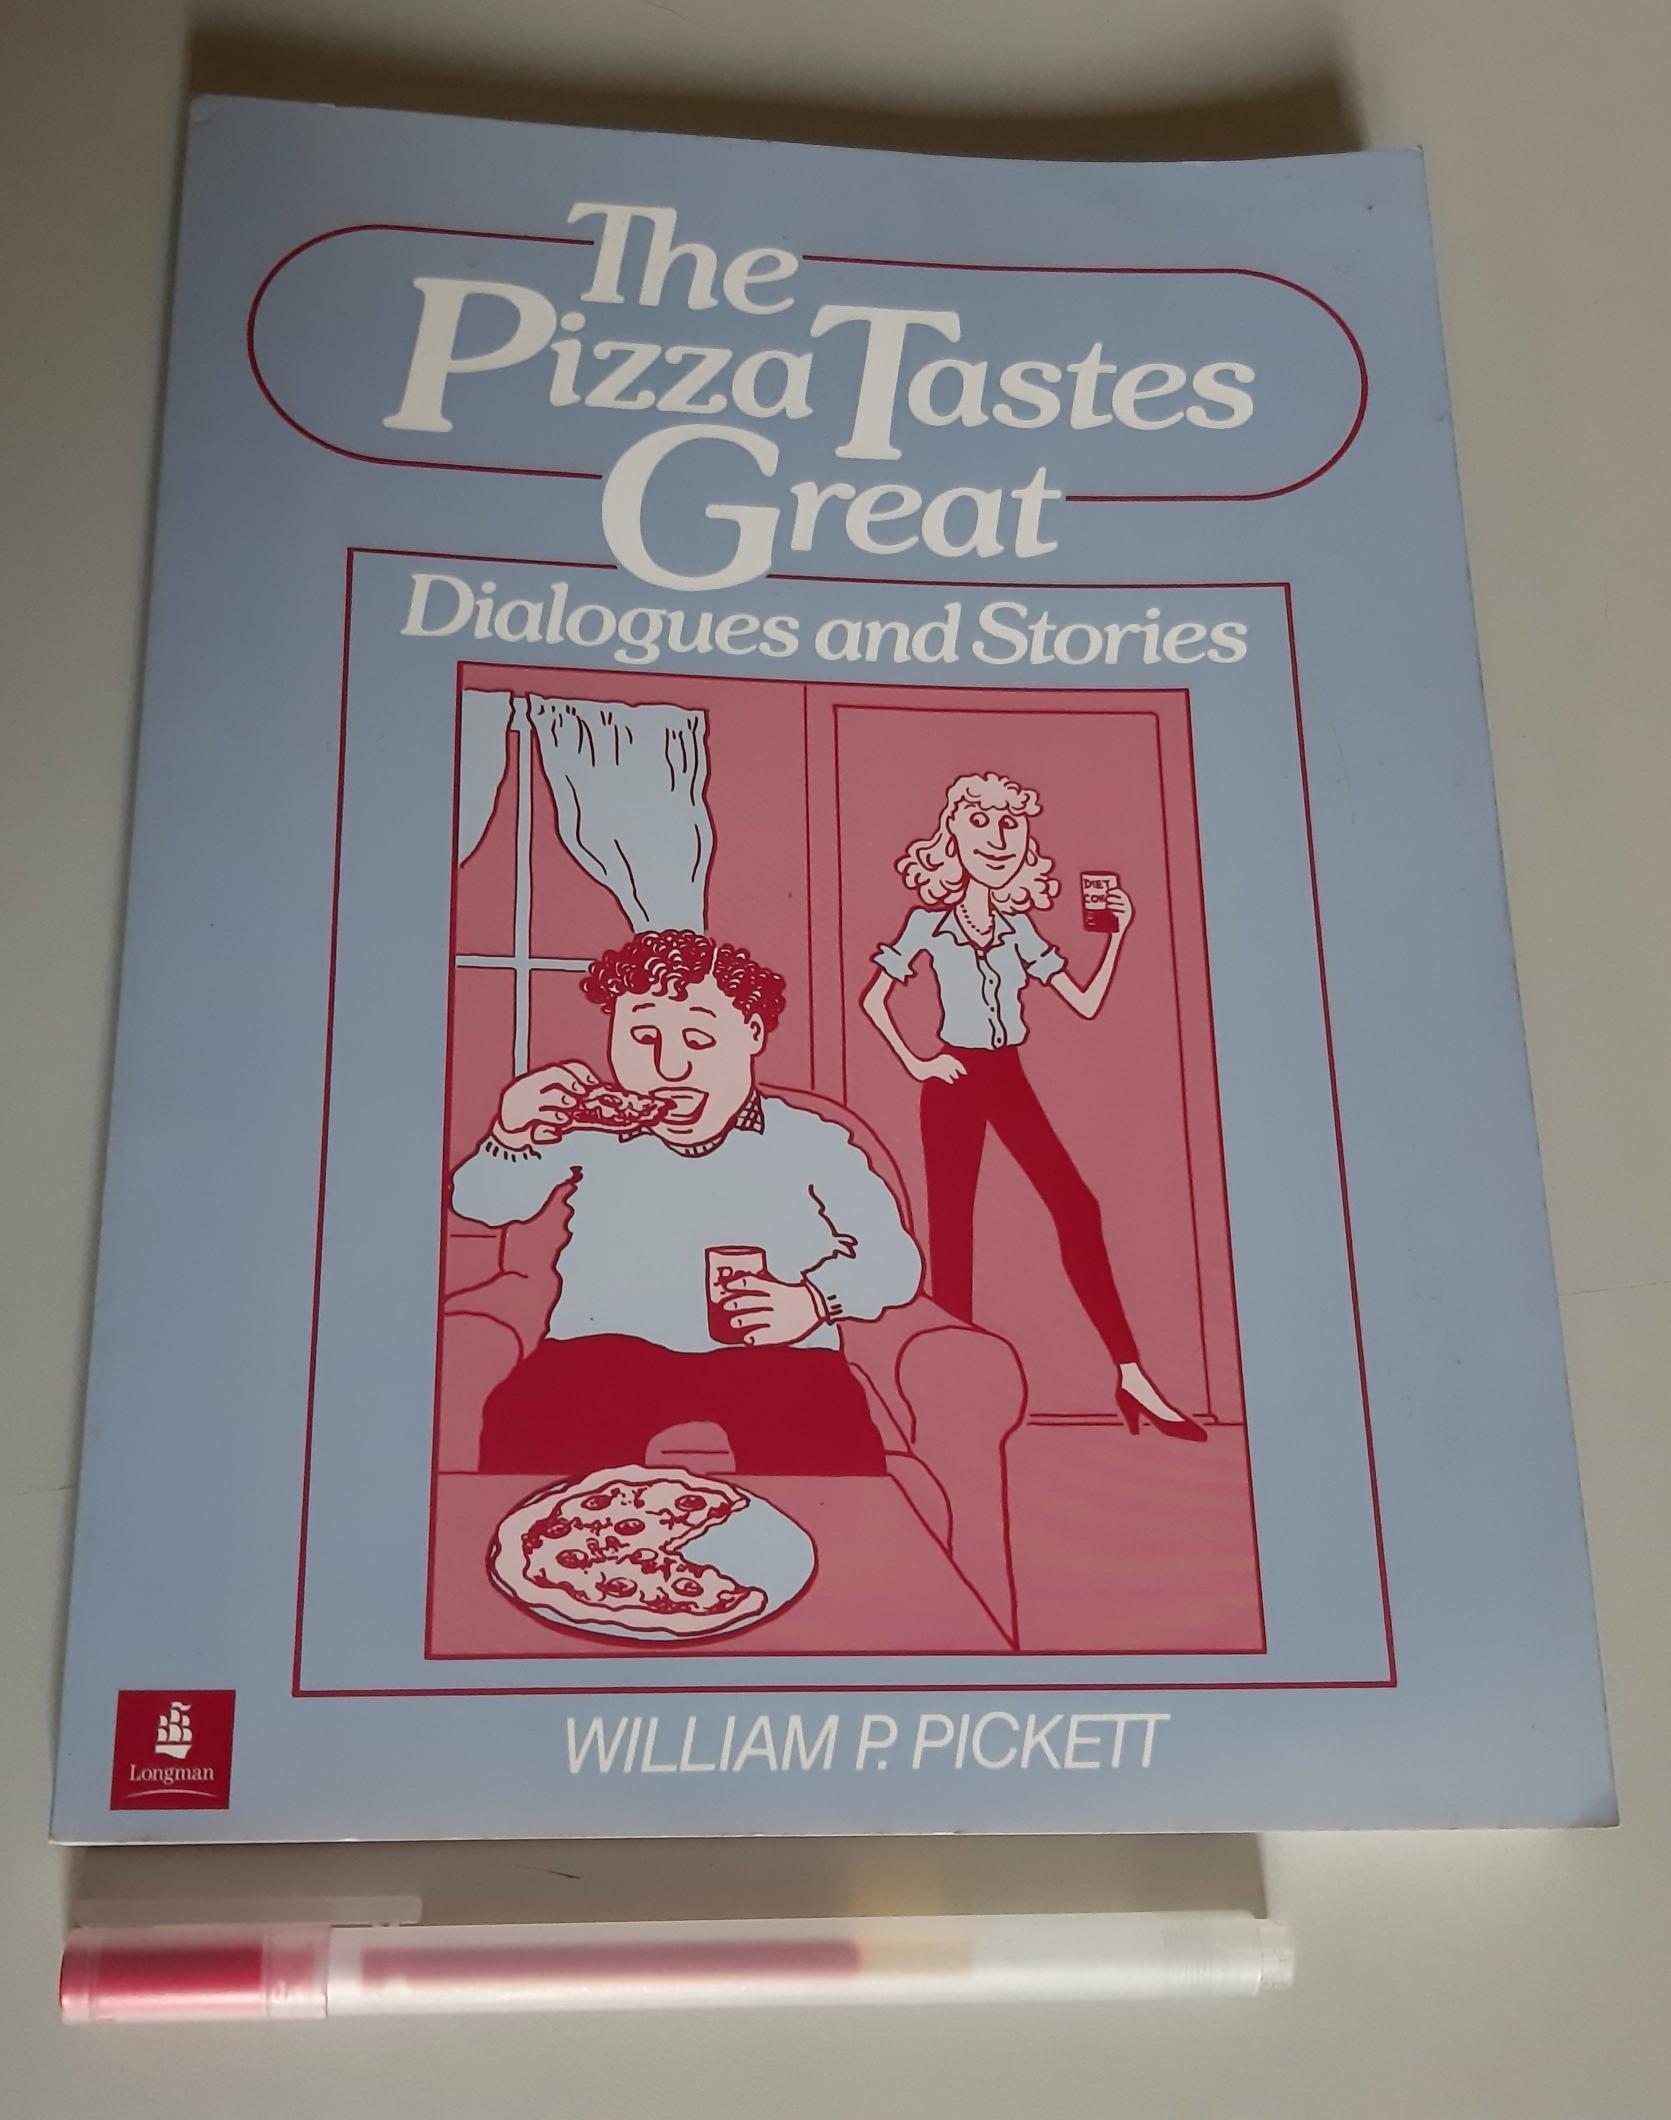 基礎英語會話和故事 The Pizza Tastes Great: Dialogues and Stories 附解答【書極新,無書寫】